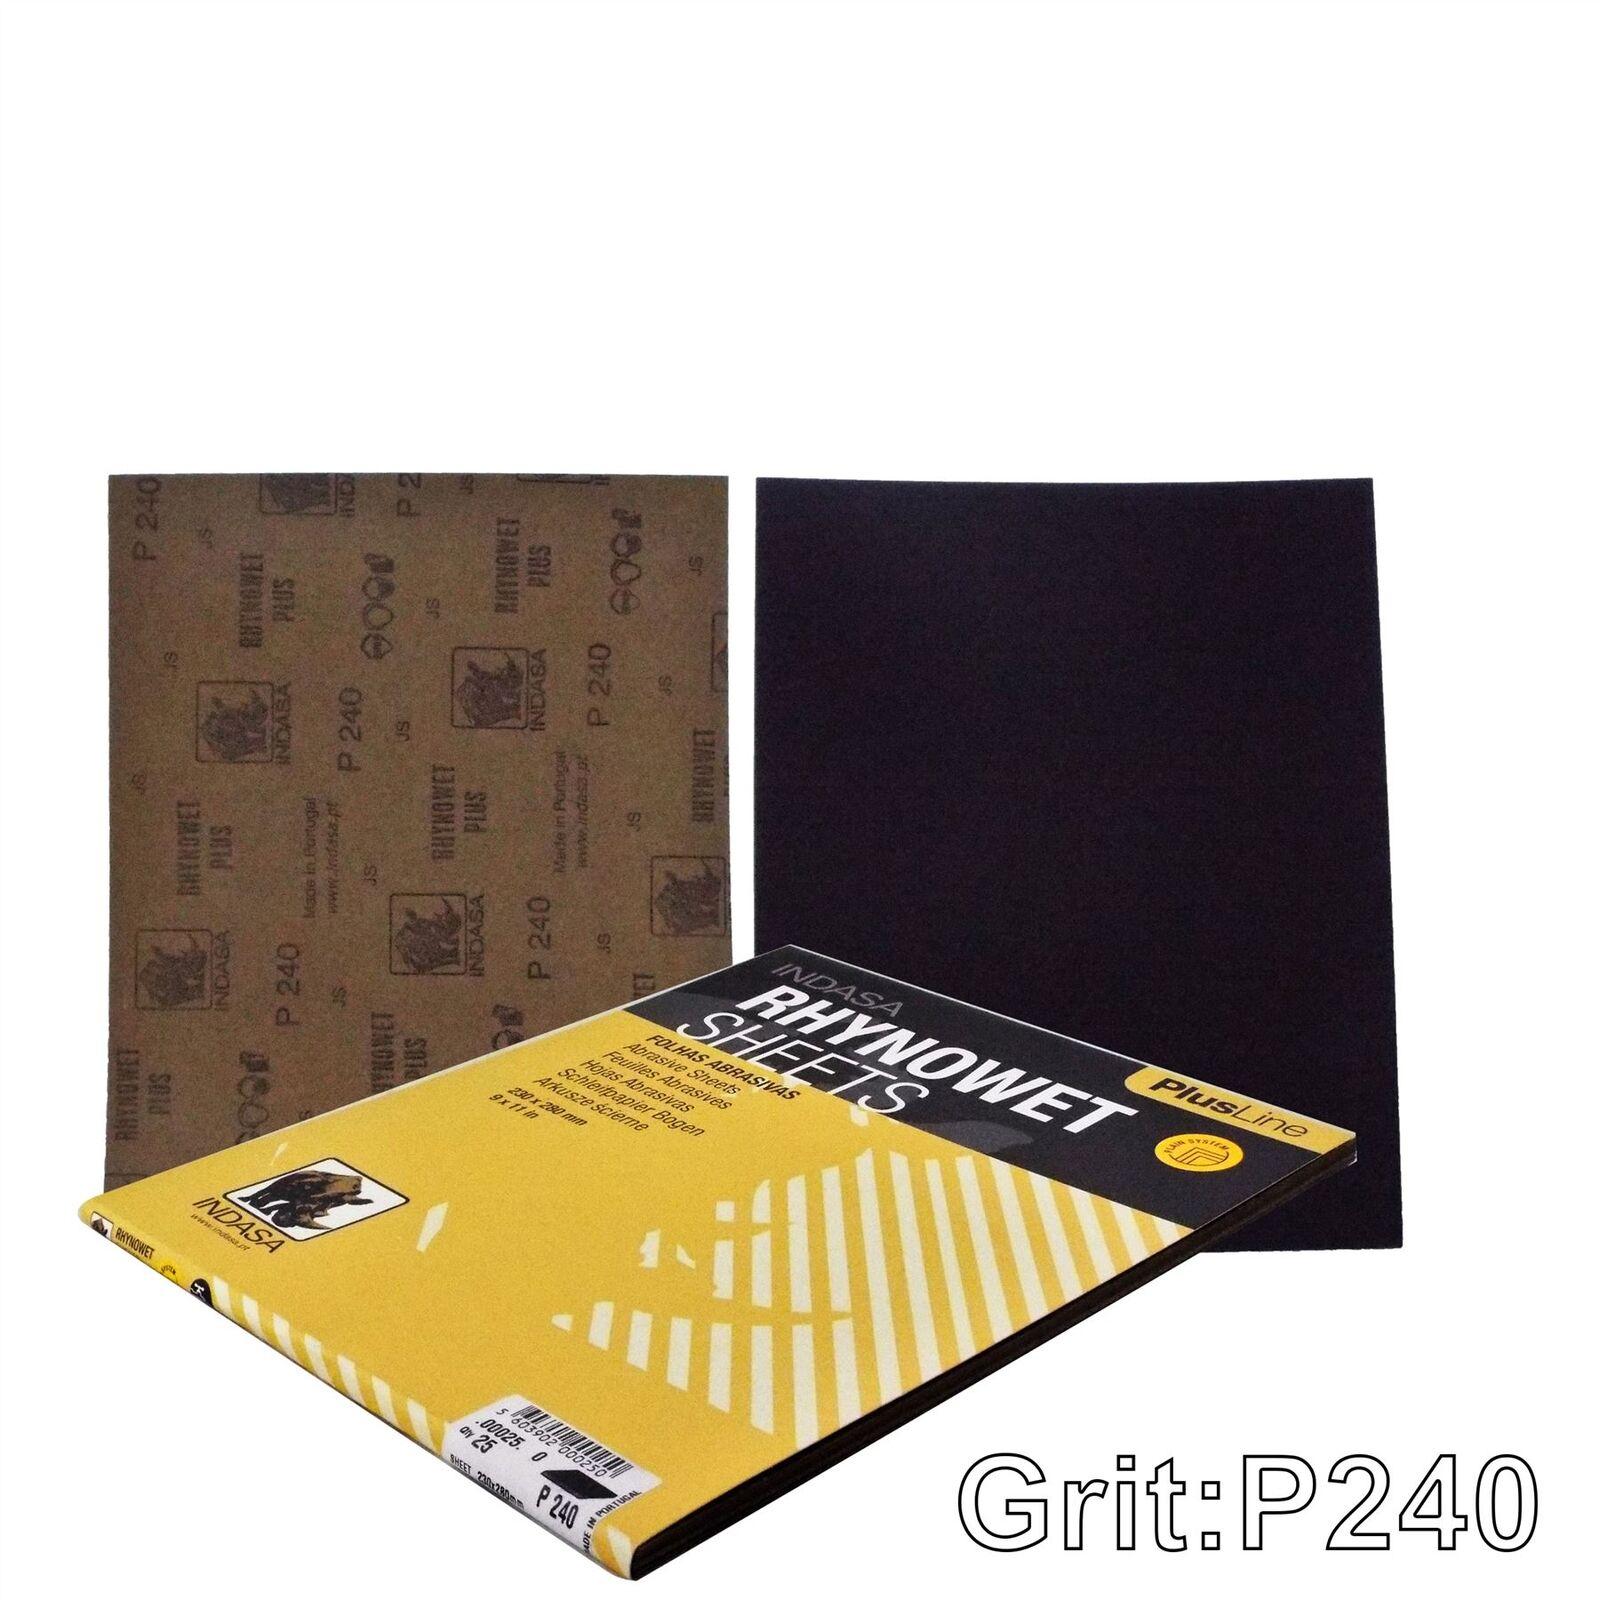 Indasa Rhynowet Plusline C00025 Sanding Sheets 230x280mm P240 Grit 25 Sheets 5603902000250 Ebay What marketing strategies does scieme use? ebay